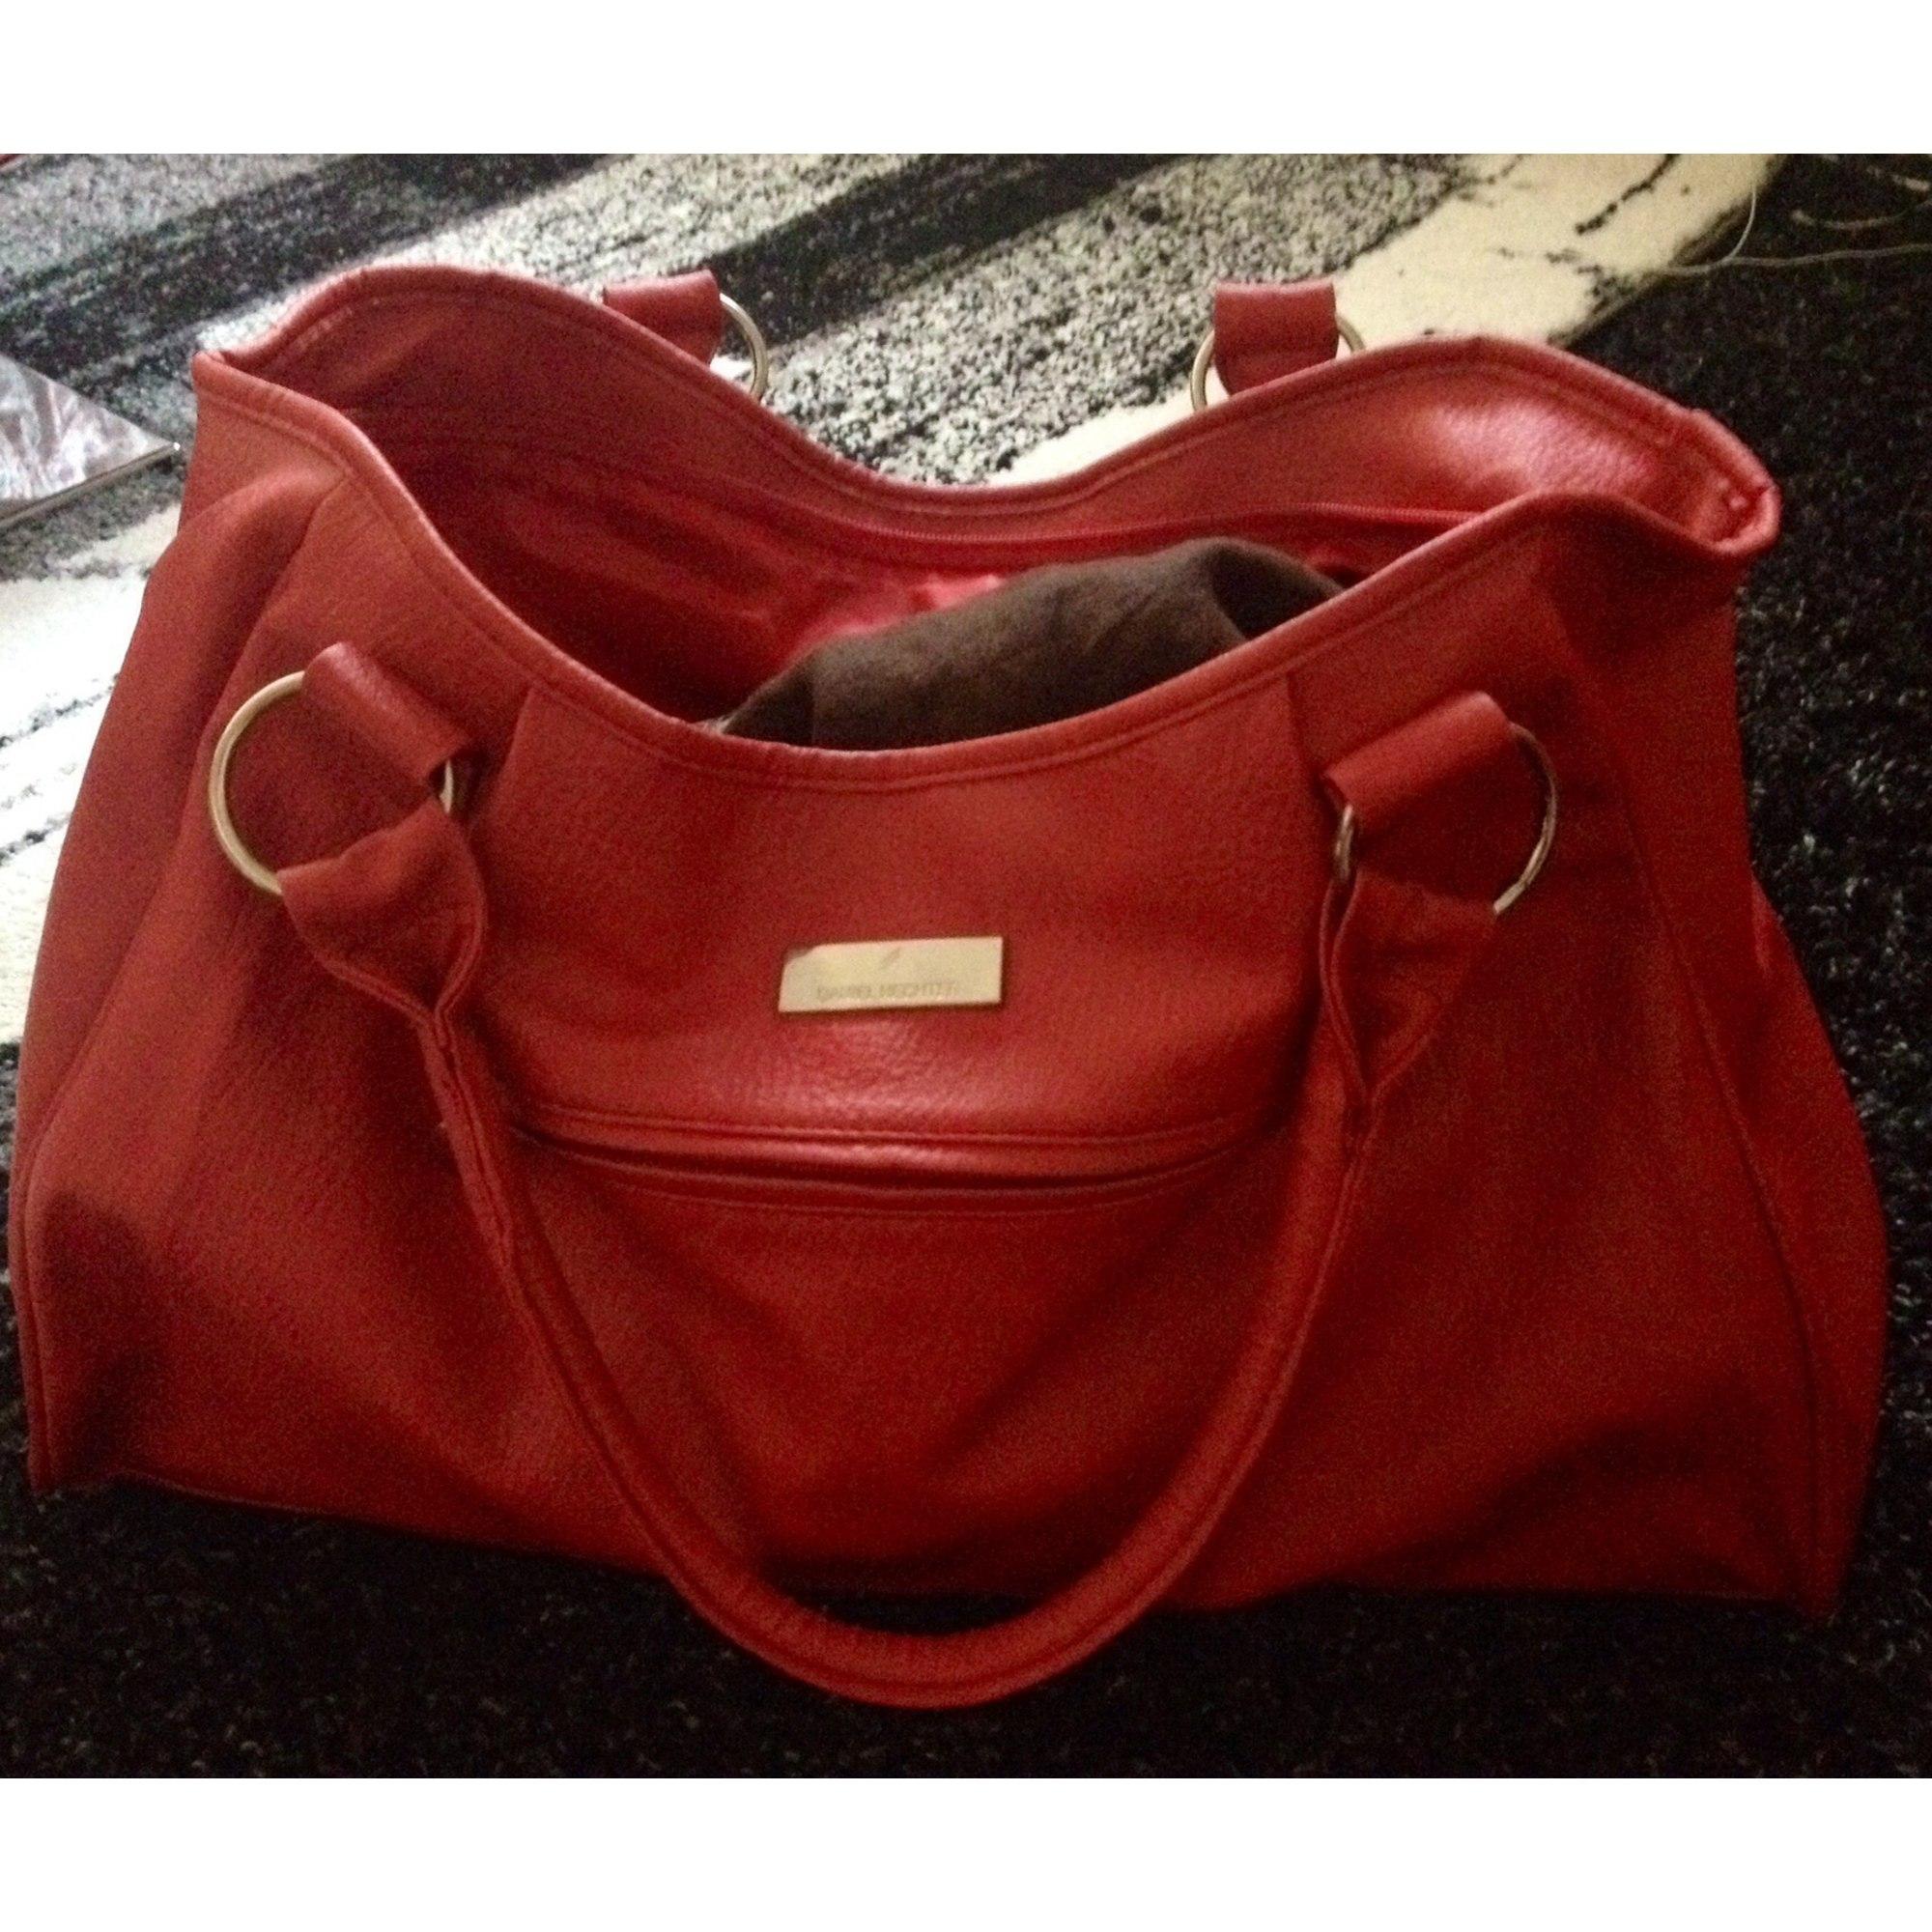 the latest 7e3b7 c9b5e Leather Handbag DANIEL HECHTER